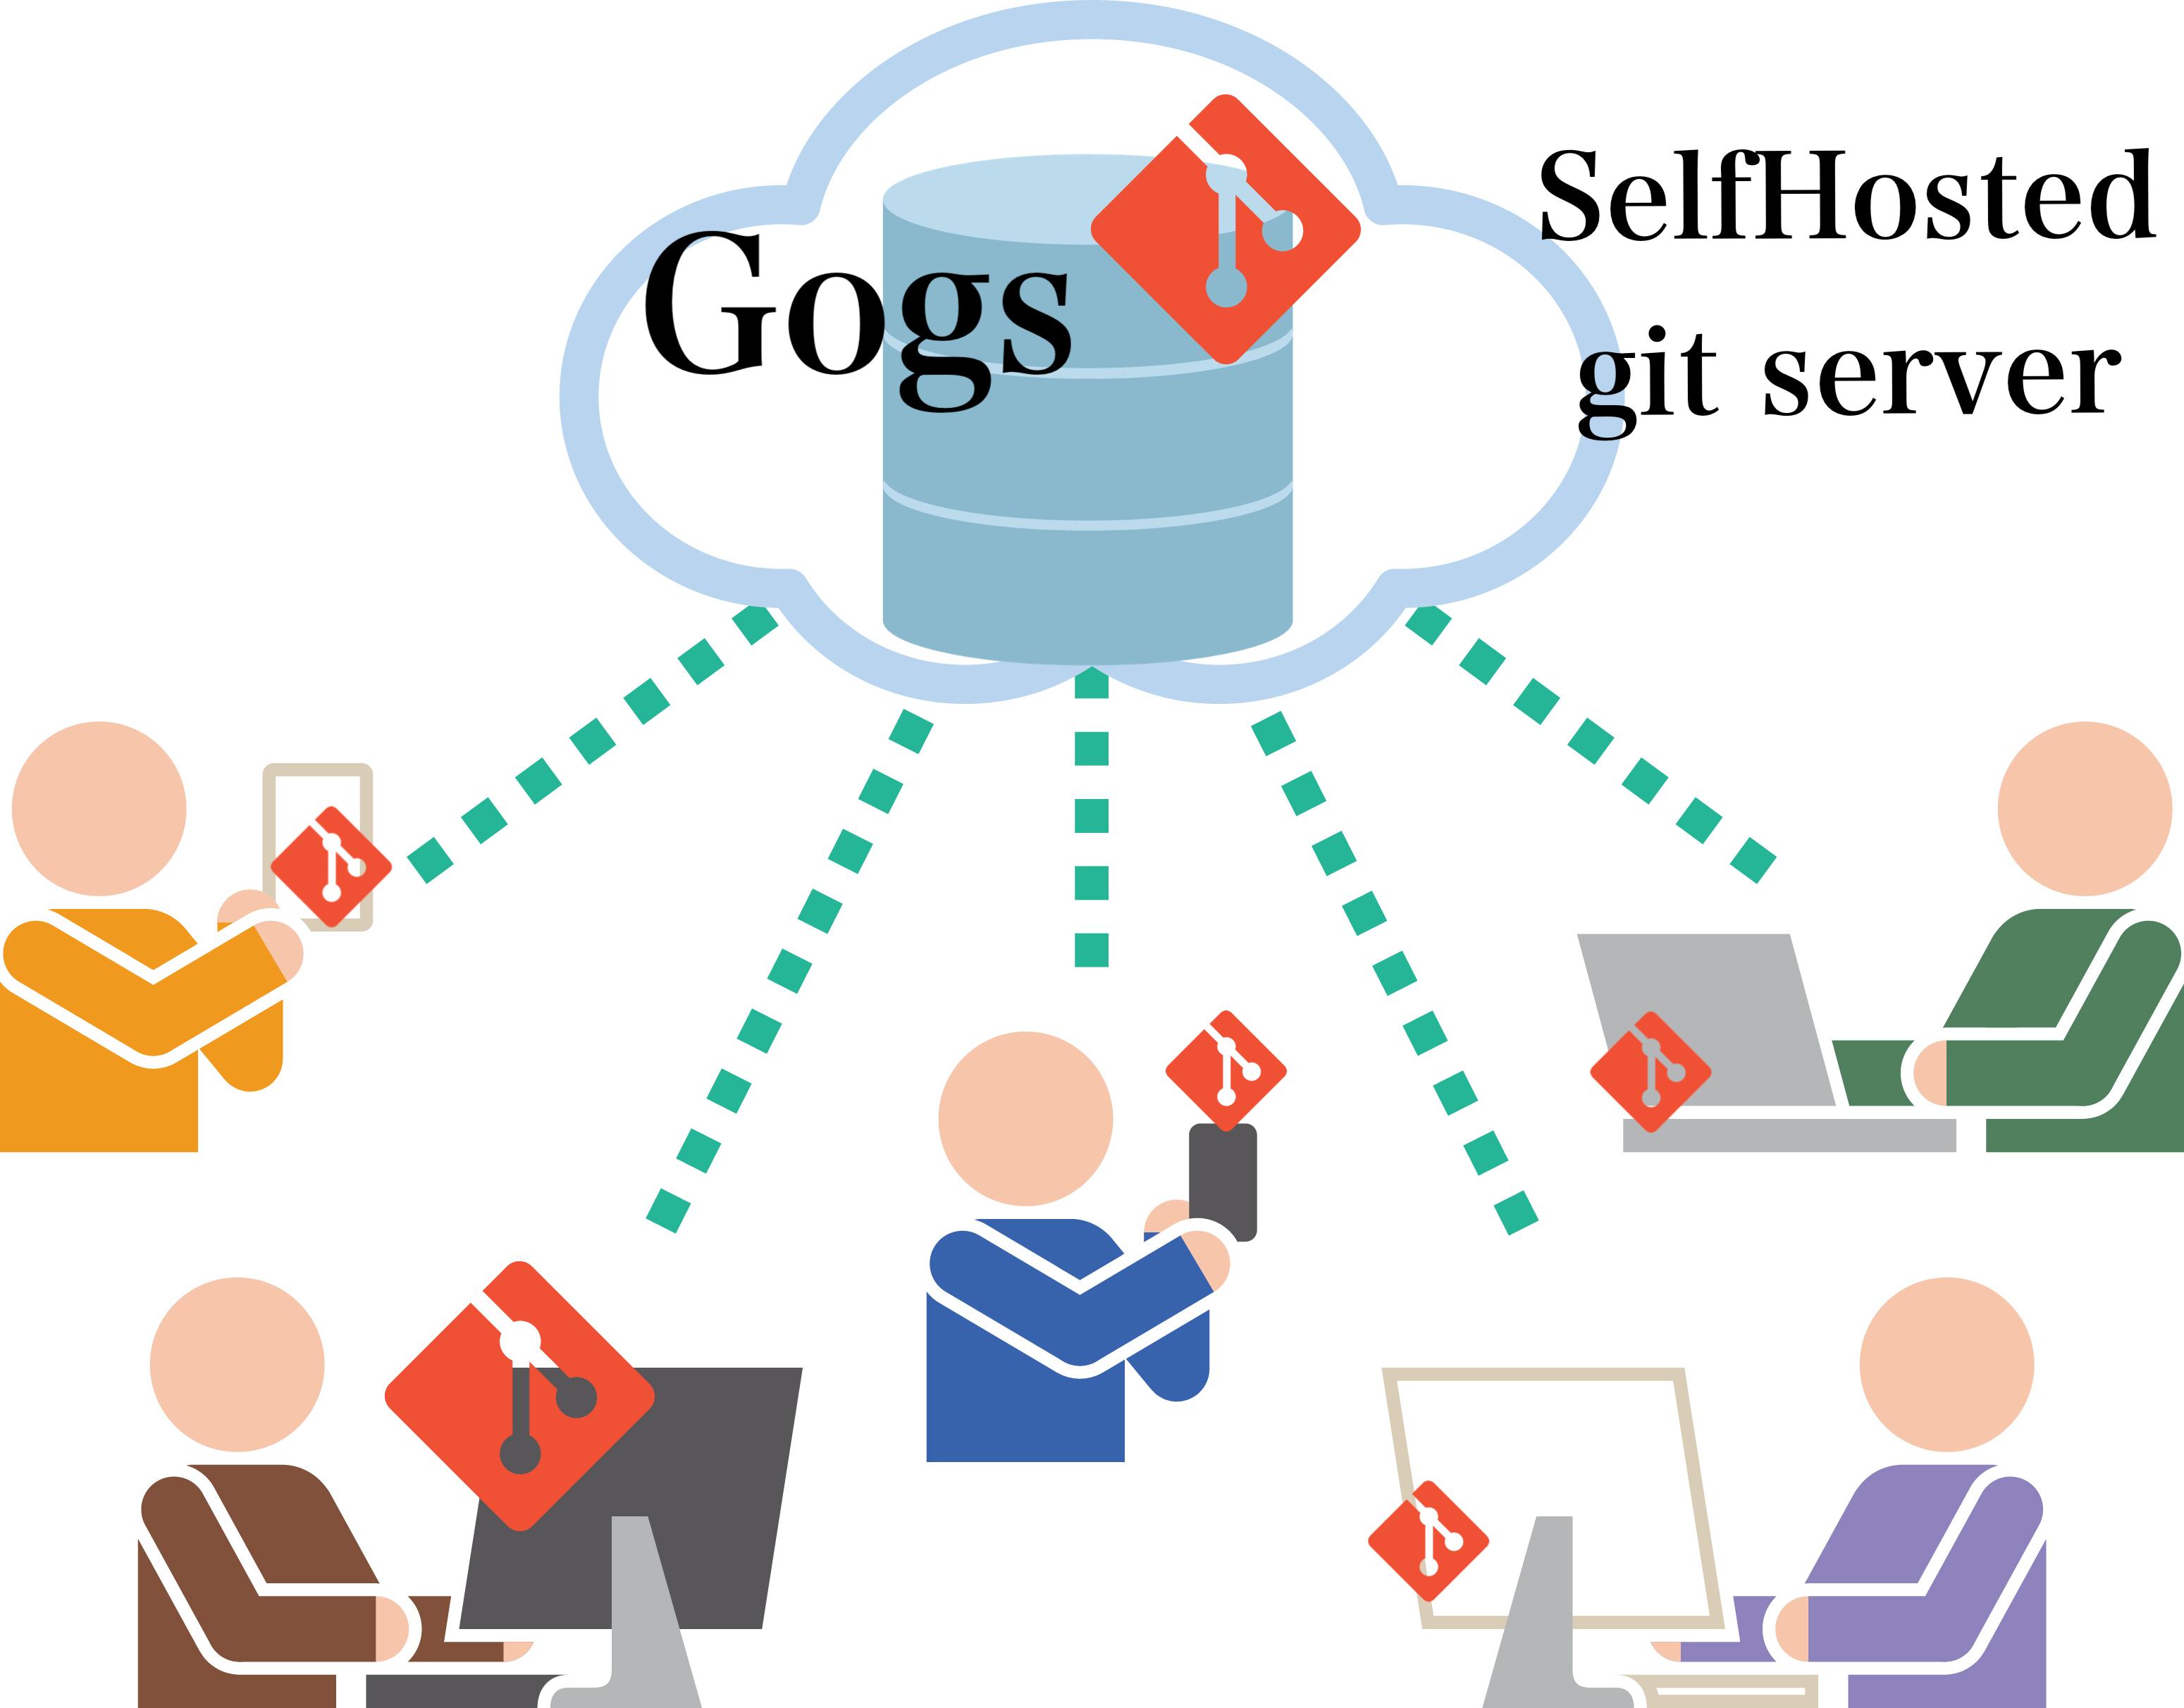 CentOS7上にSelfHostedなgit repository serverのGogsを構築する方法